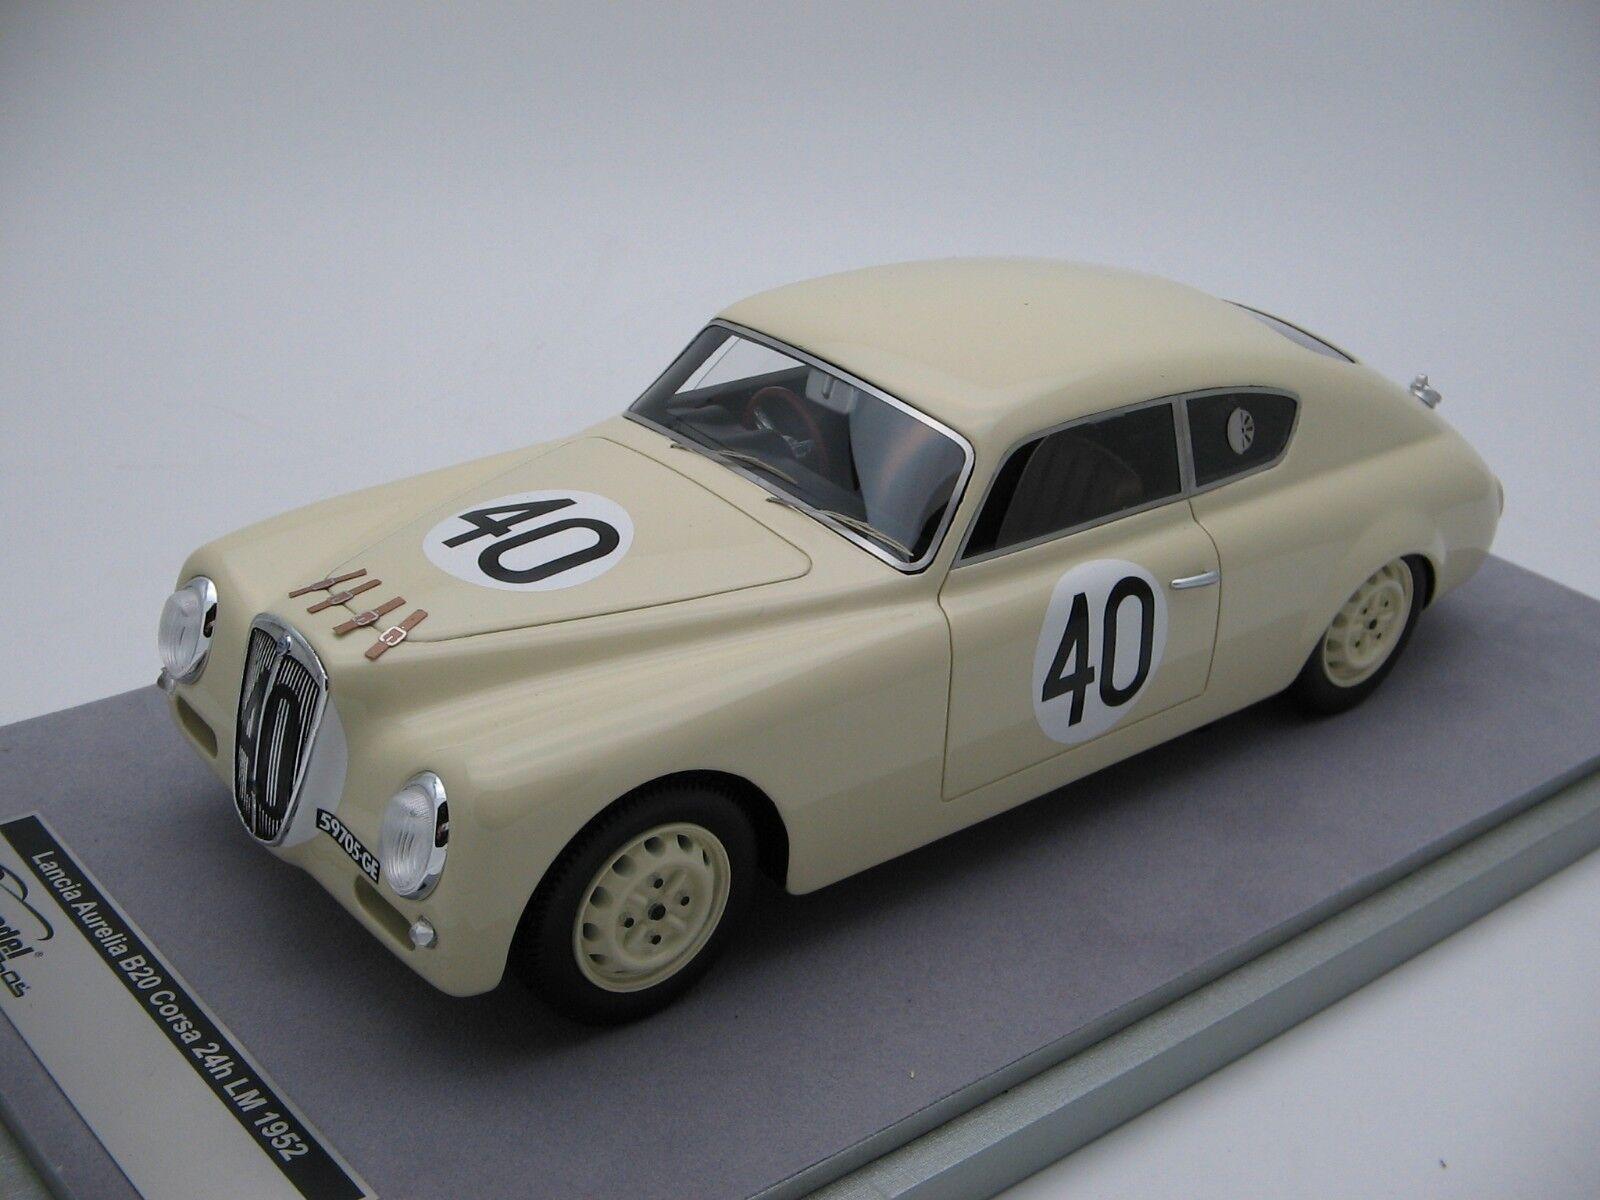 1 18 scale Tecnomodel Lancia Aurelia B20 Corsa Le Mans 24h car TM18-69C